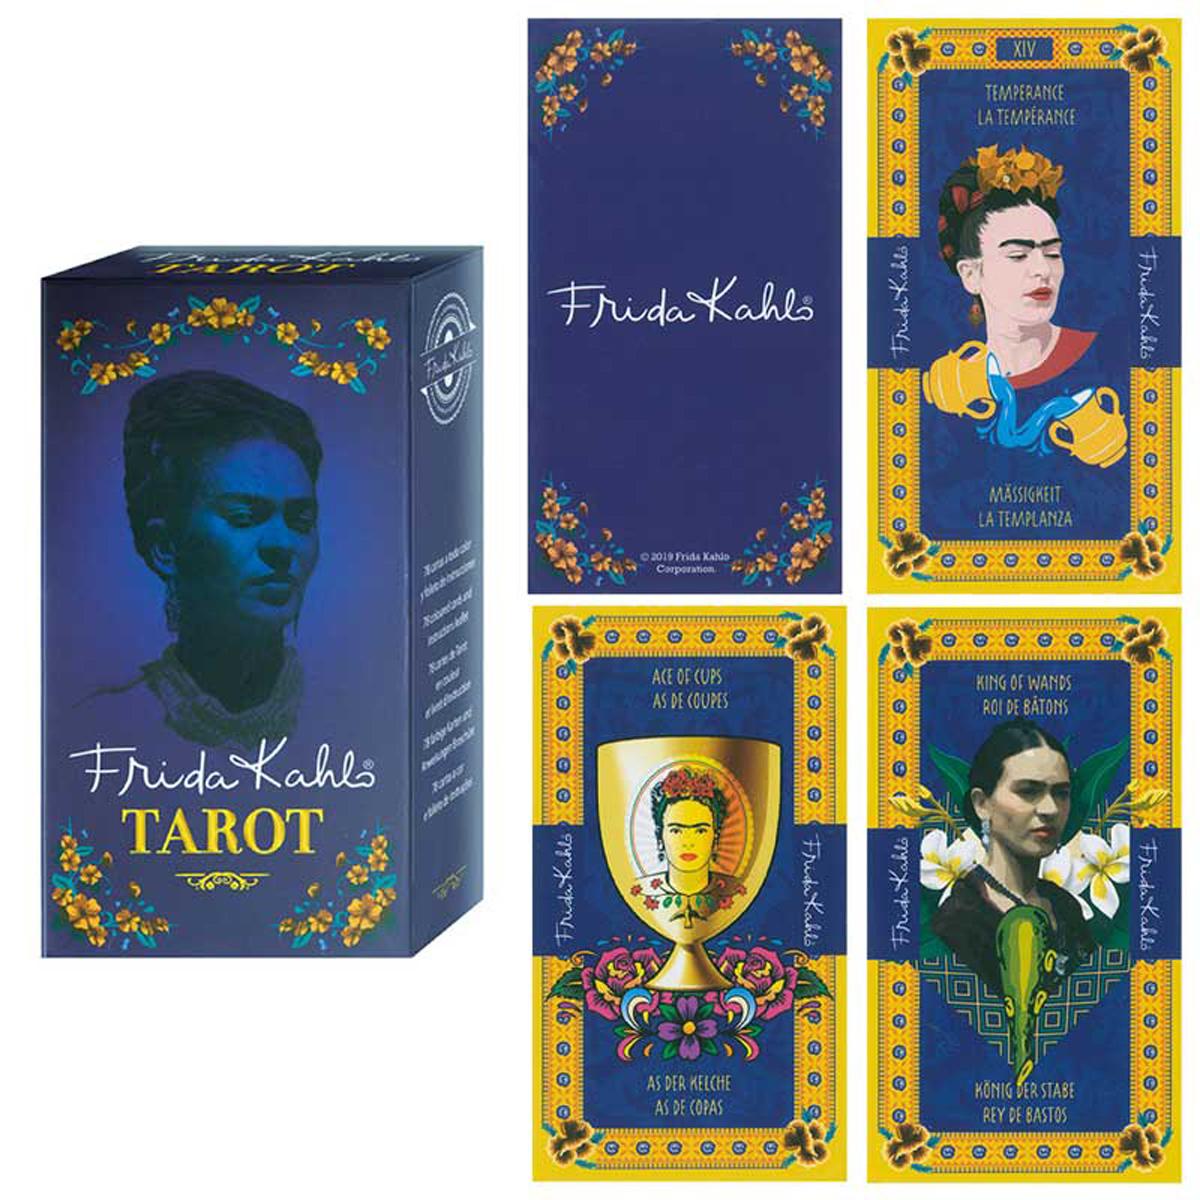 Tarot Créateur \'Frida Kahlo\' bleu - 115x6x3 cm - [R2810]